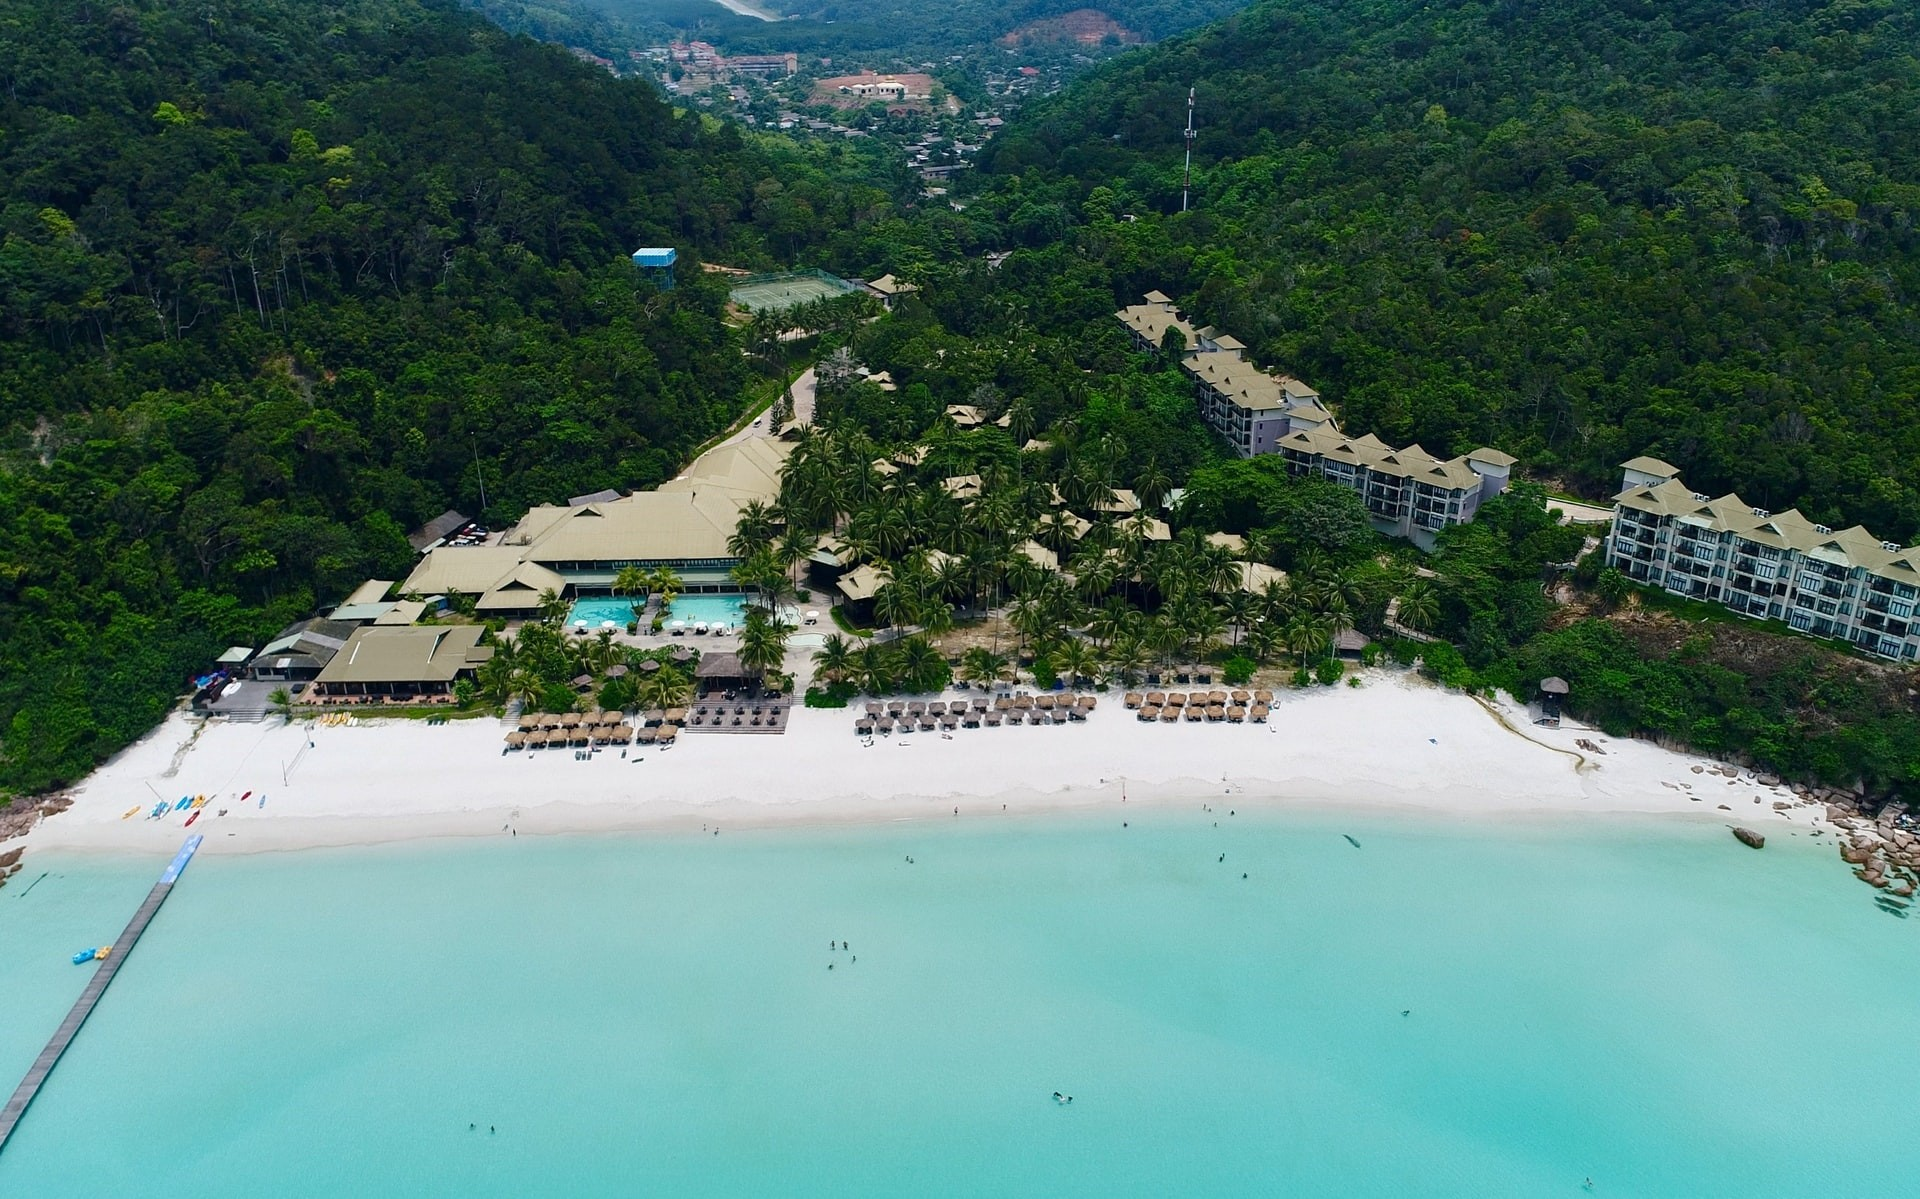 Pulau Redang Island Beach Resort